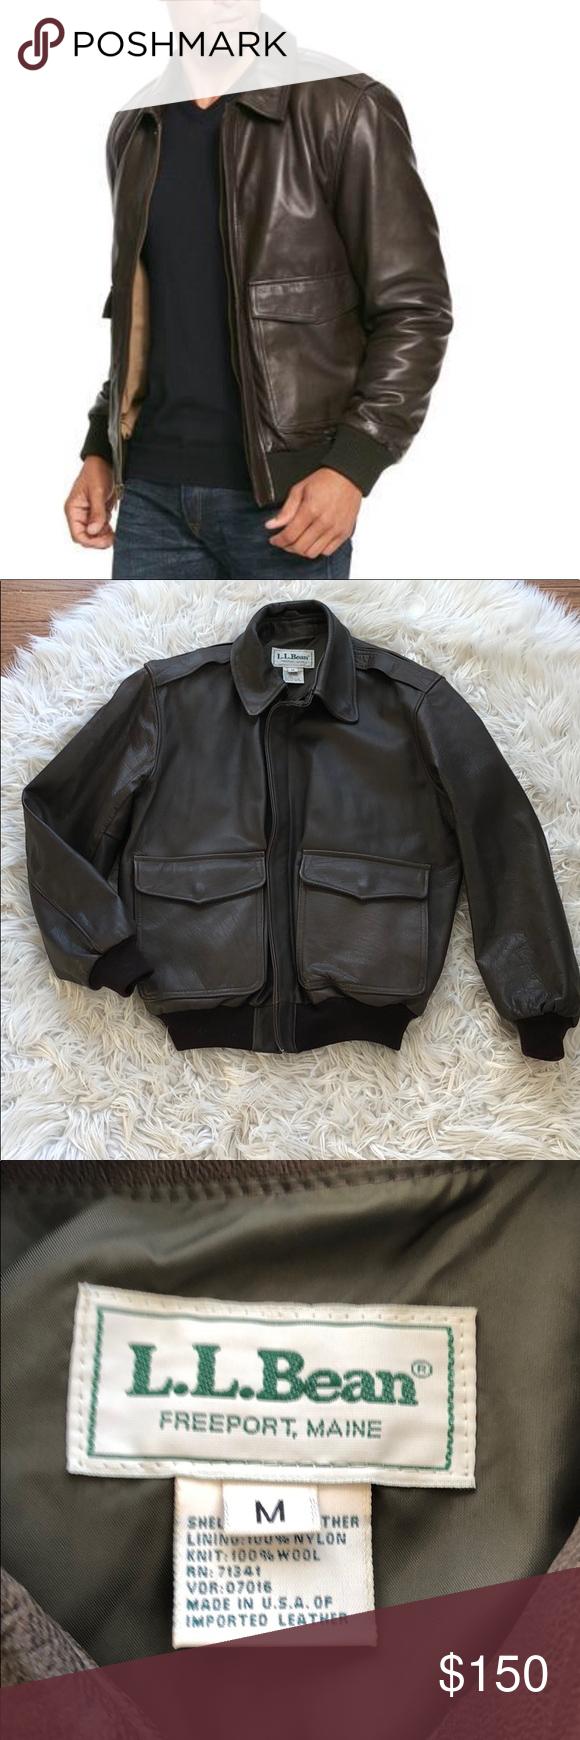 L L Bean Leather Bomber Jacket Brown Medium Leather Bomber Jacket Leather Bomber Clothes Design